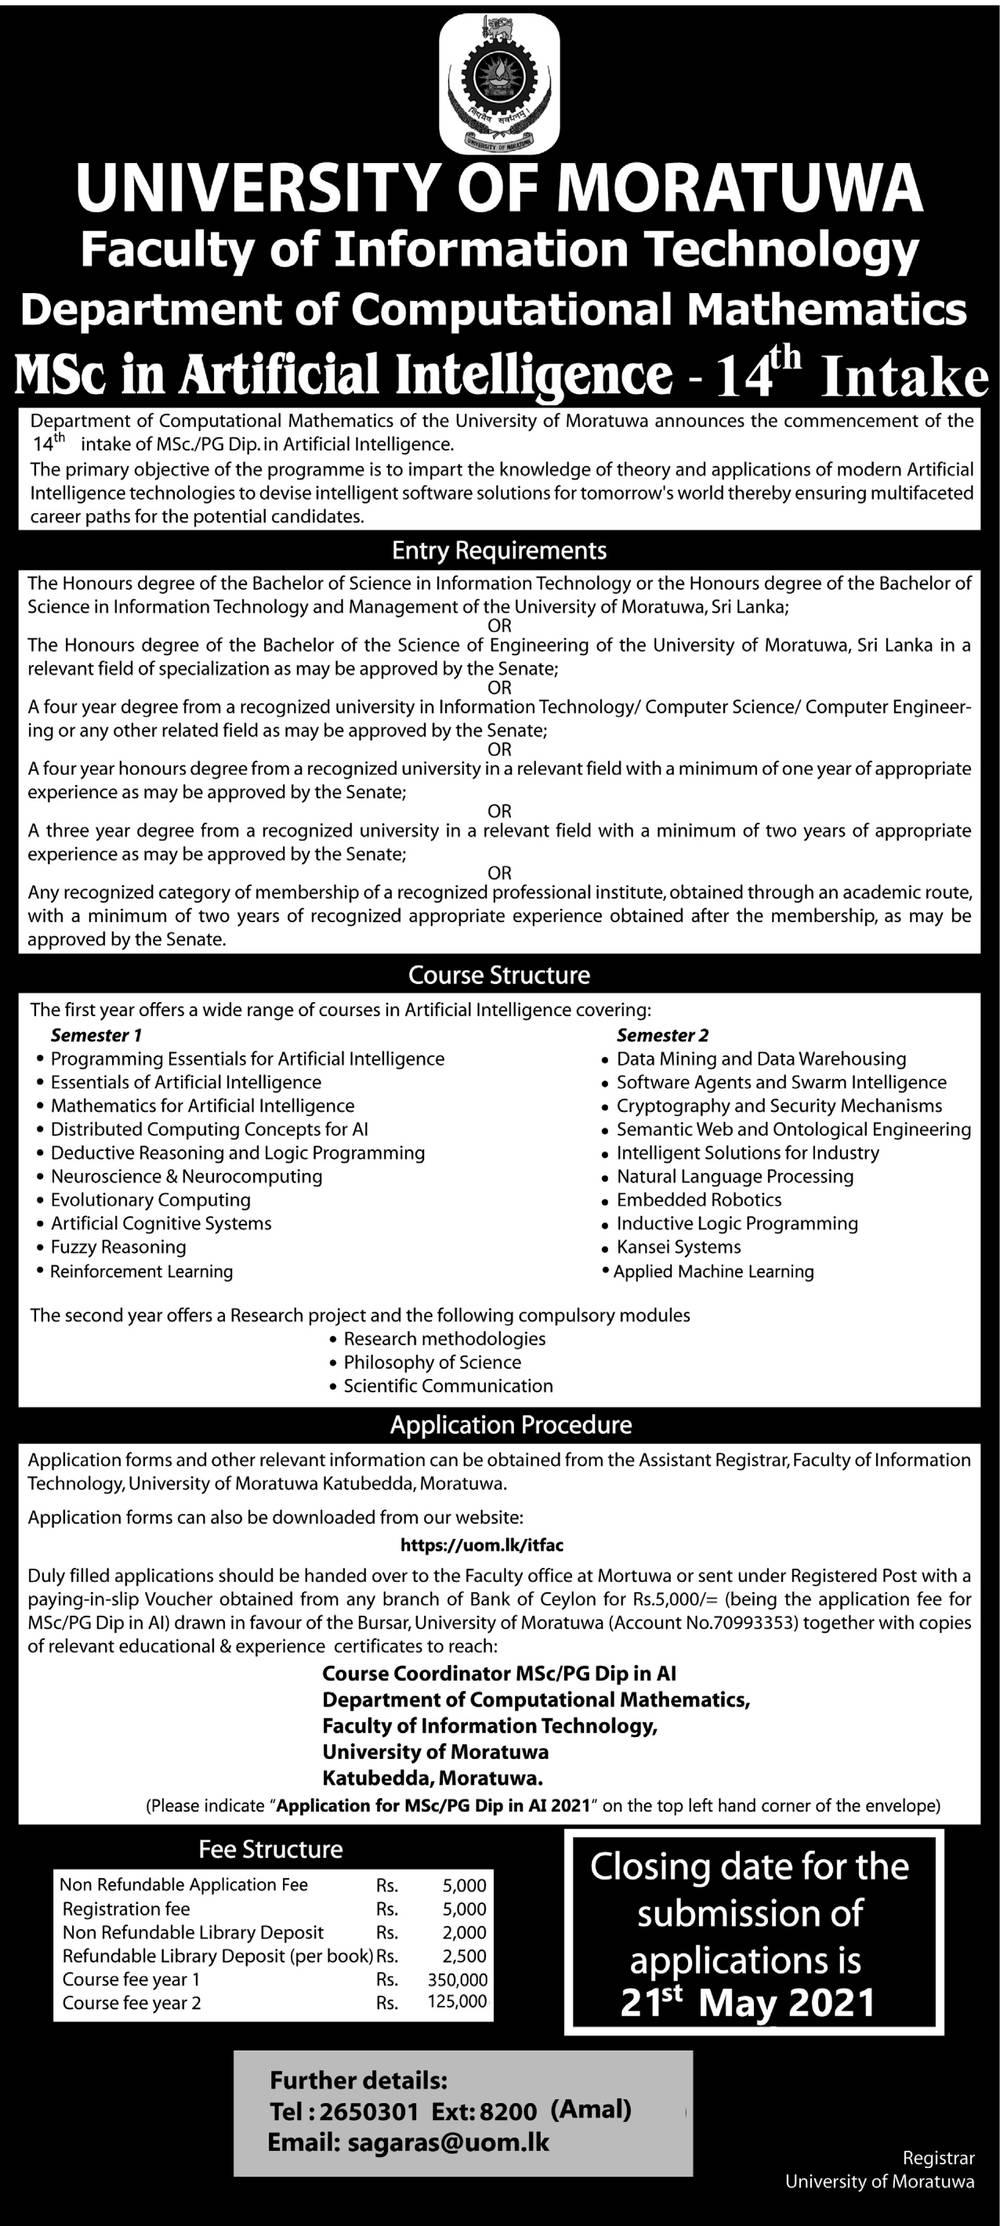 MSc in Artificial Intelligence - Faculty of Information Technology - University of Moratuwa